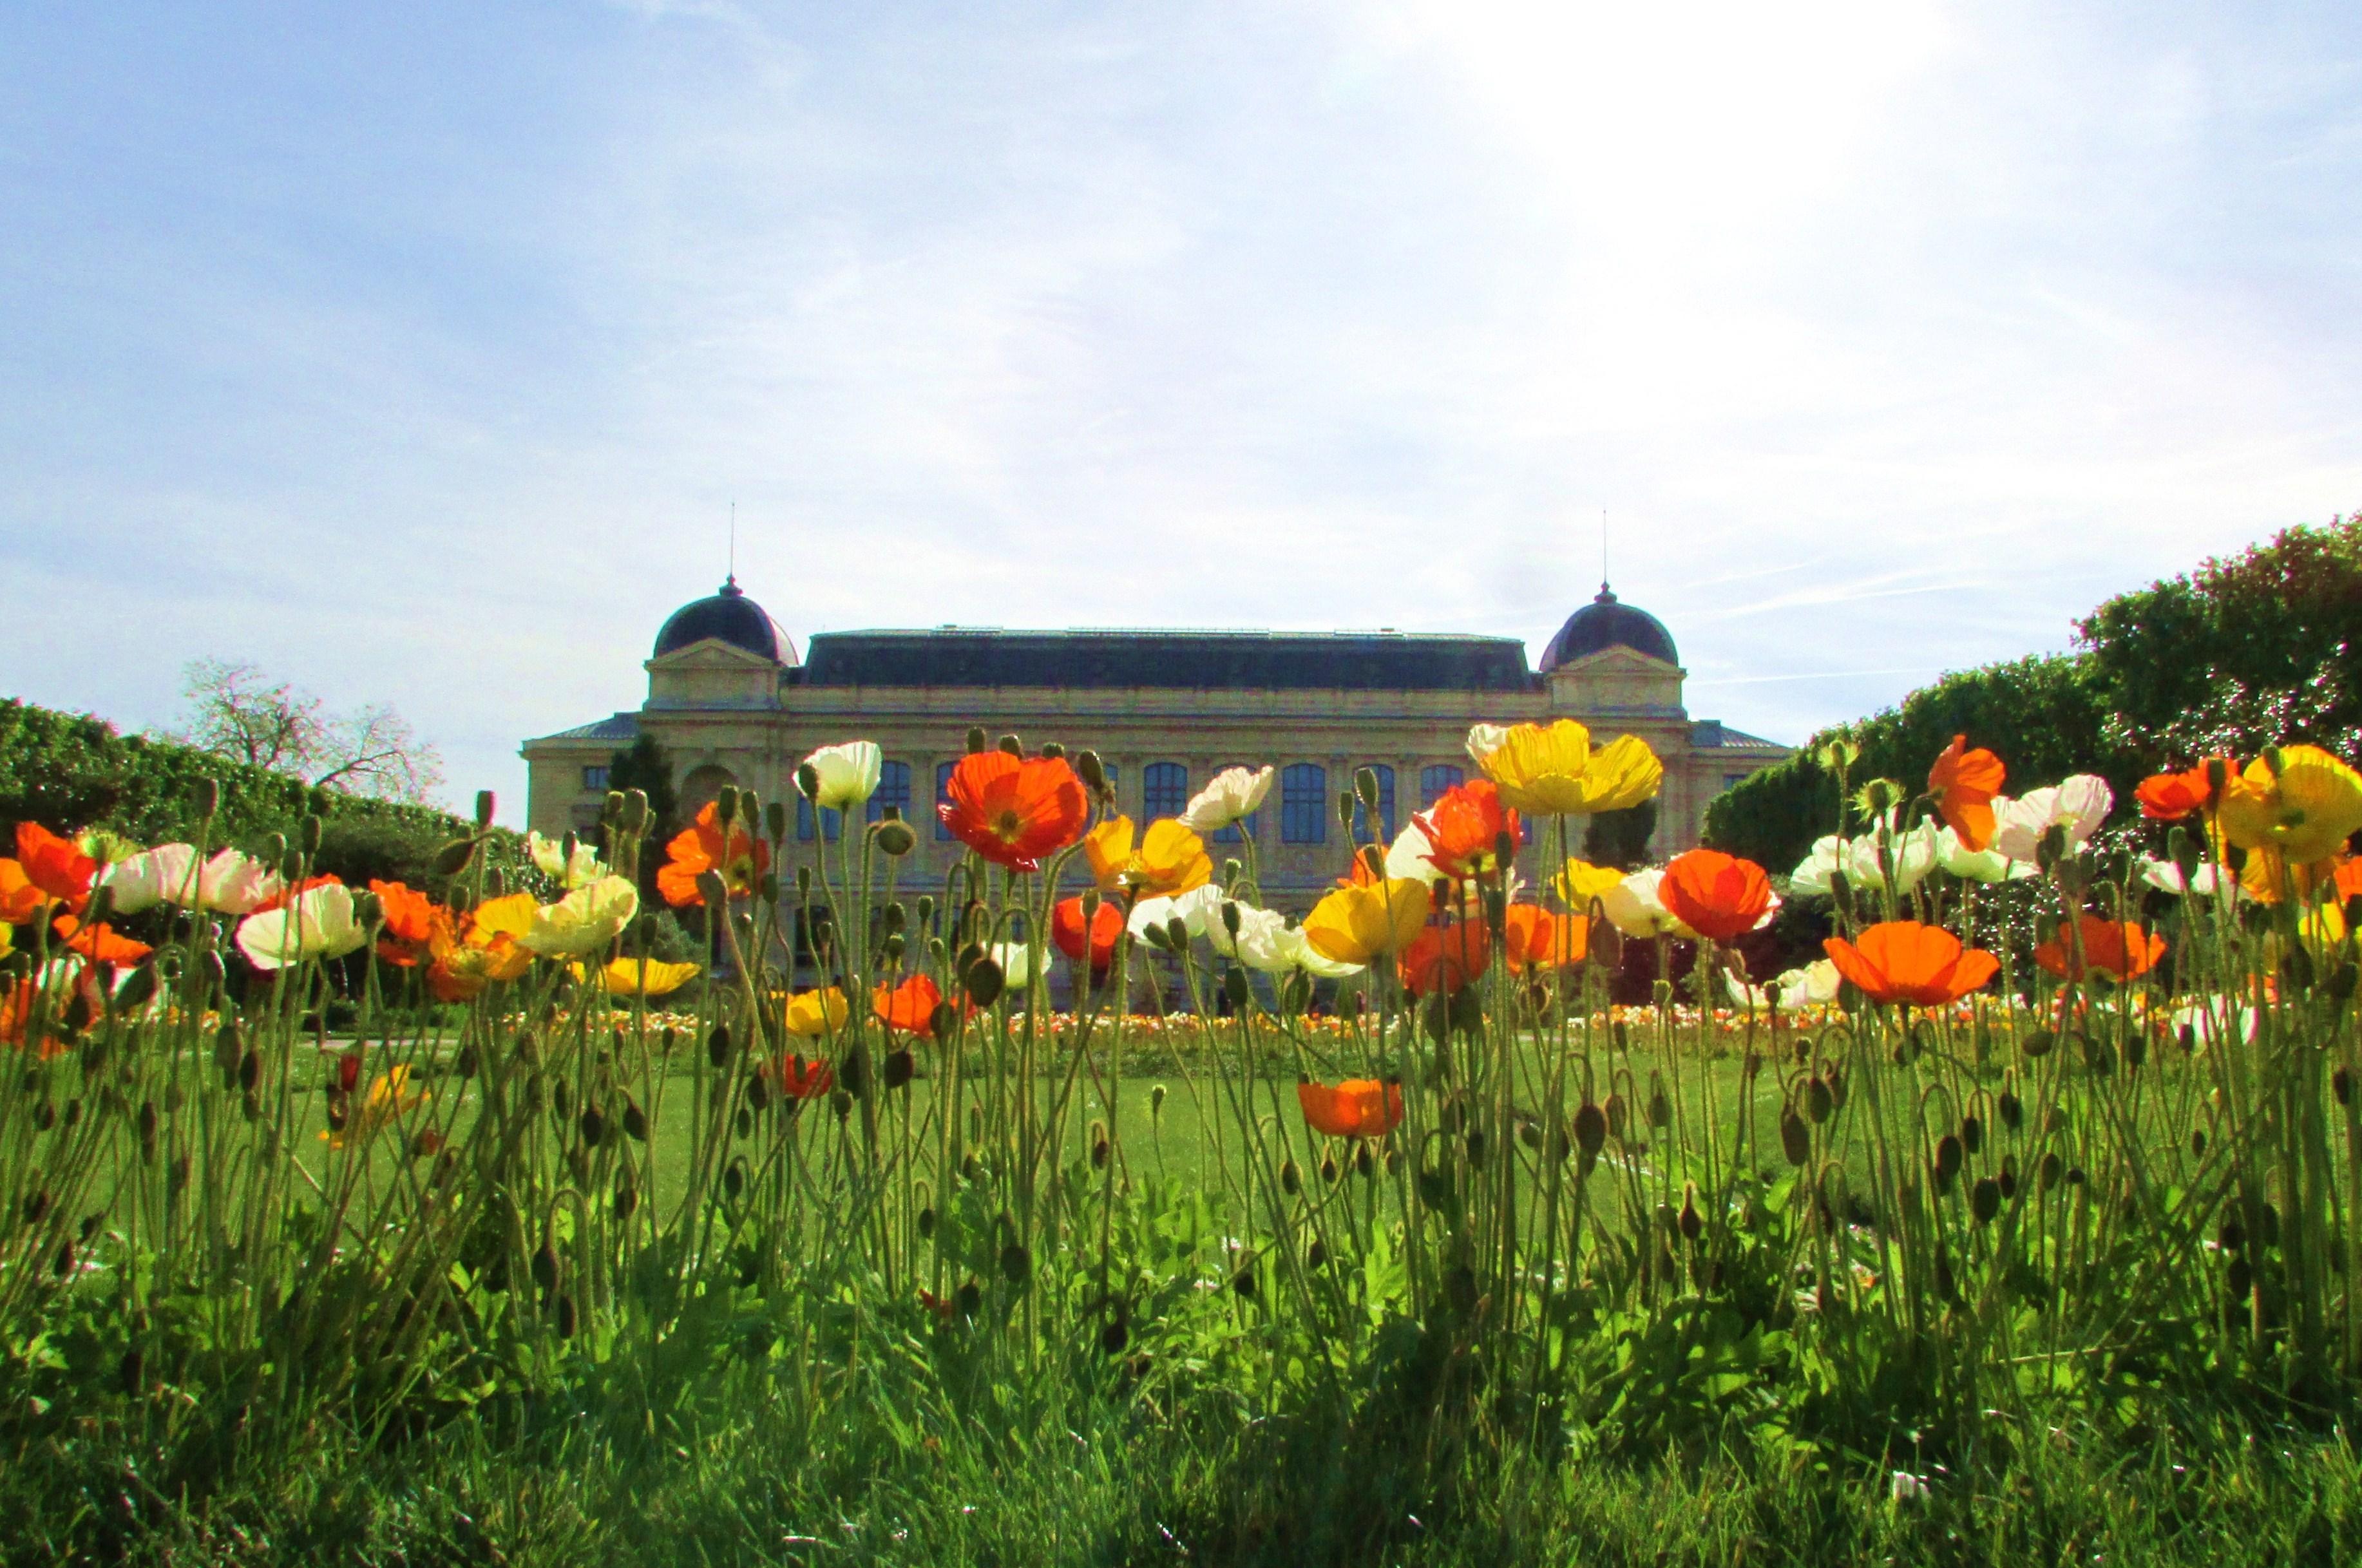 Springtime at jardin des plantes paris francois et moi - Jardin des plantes paris ...